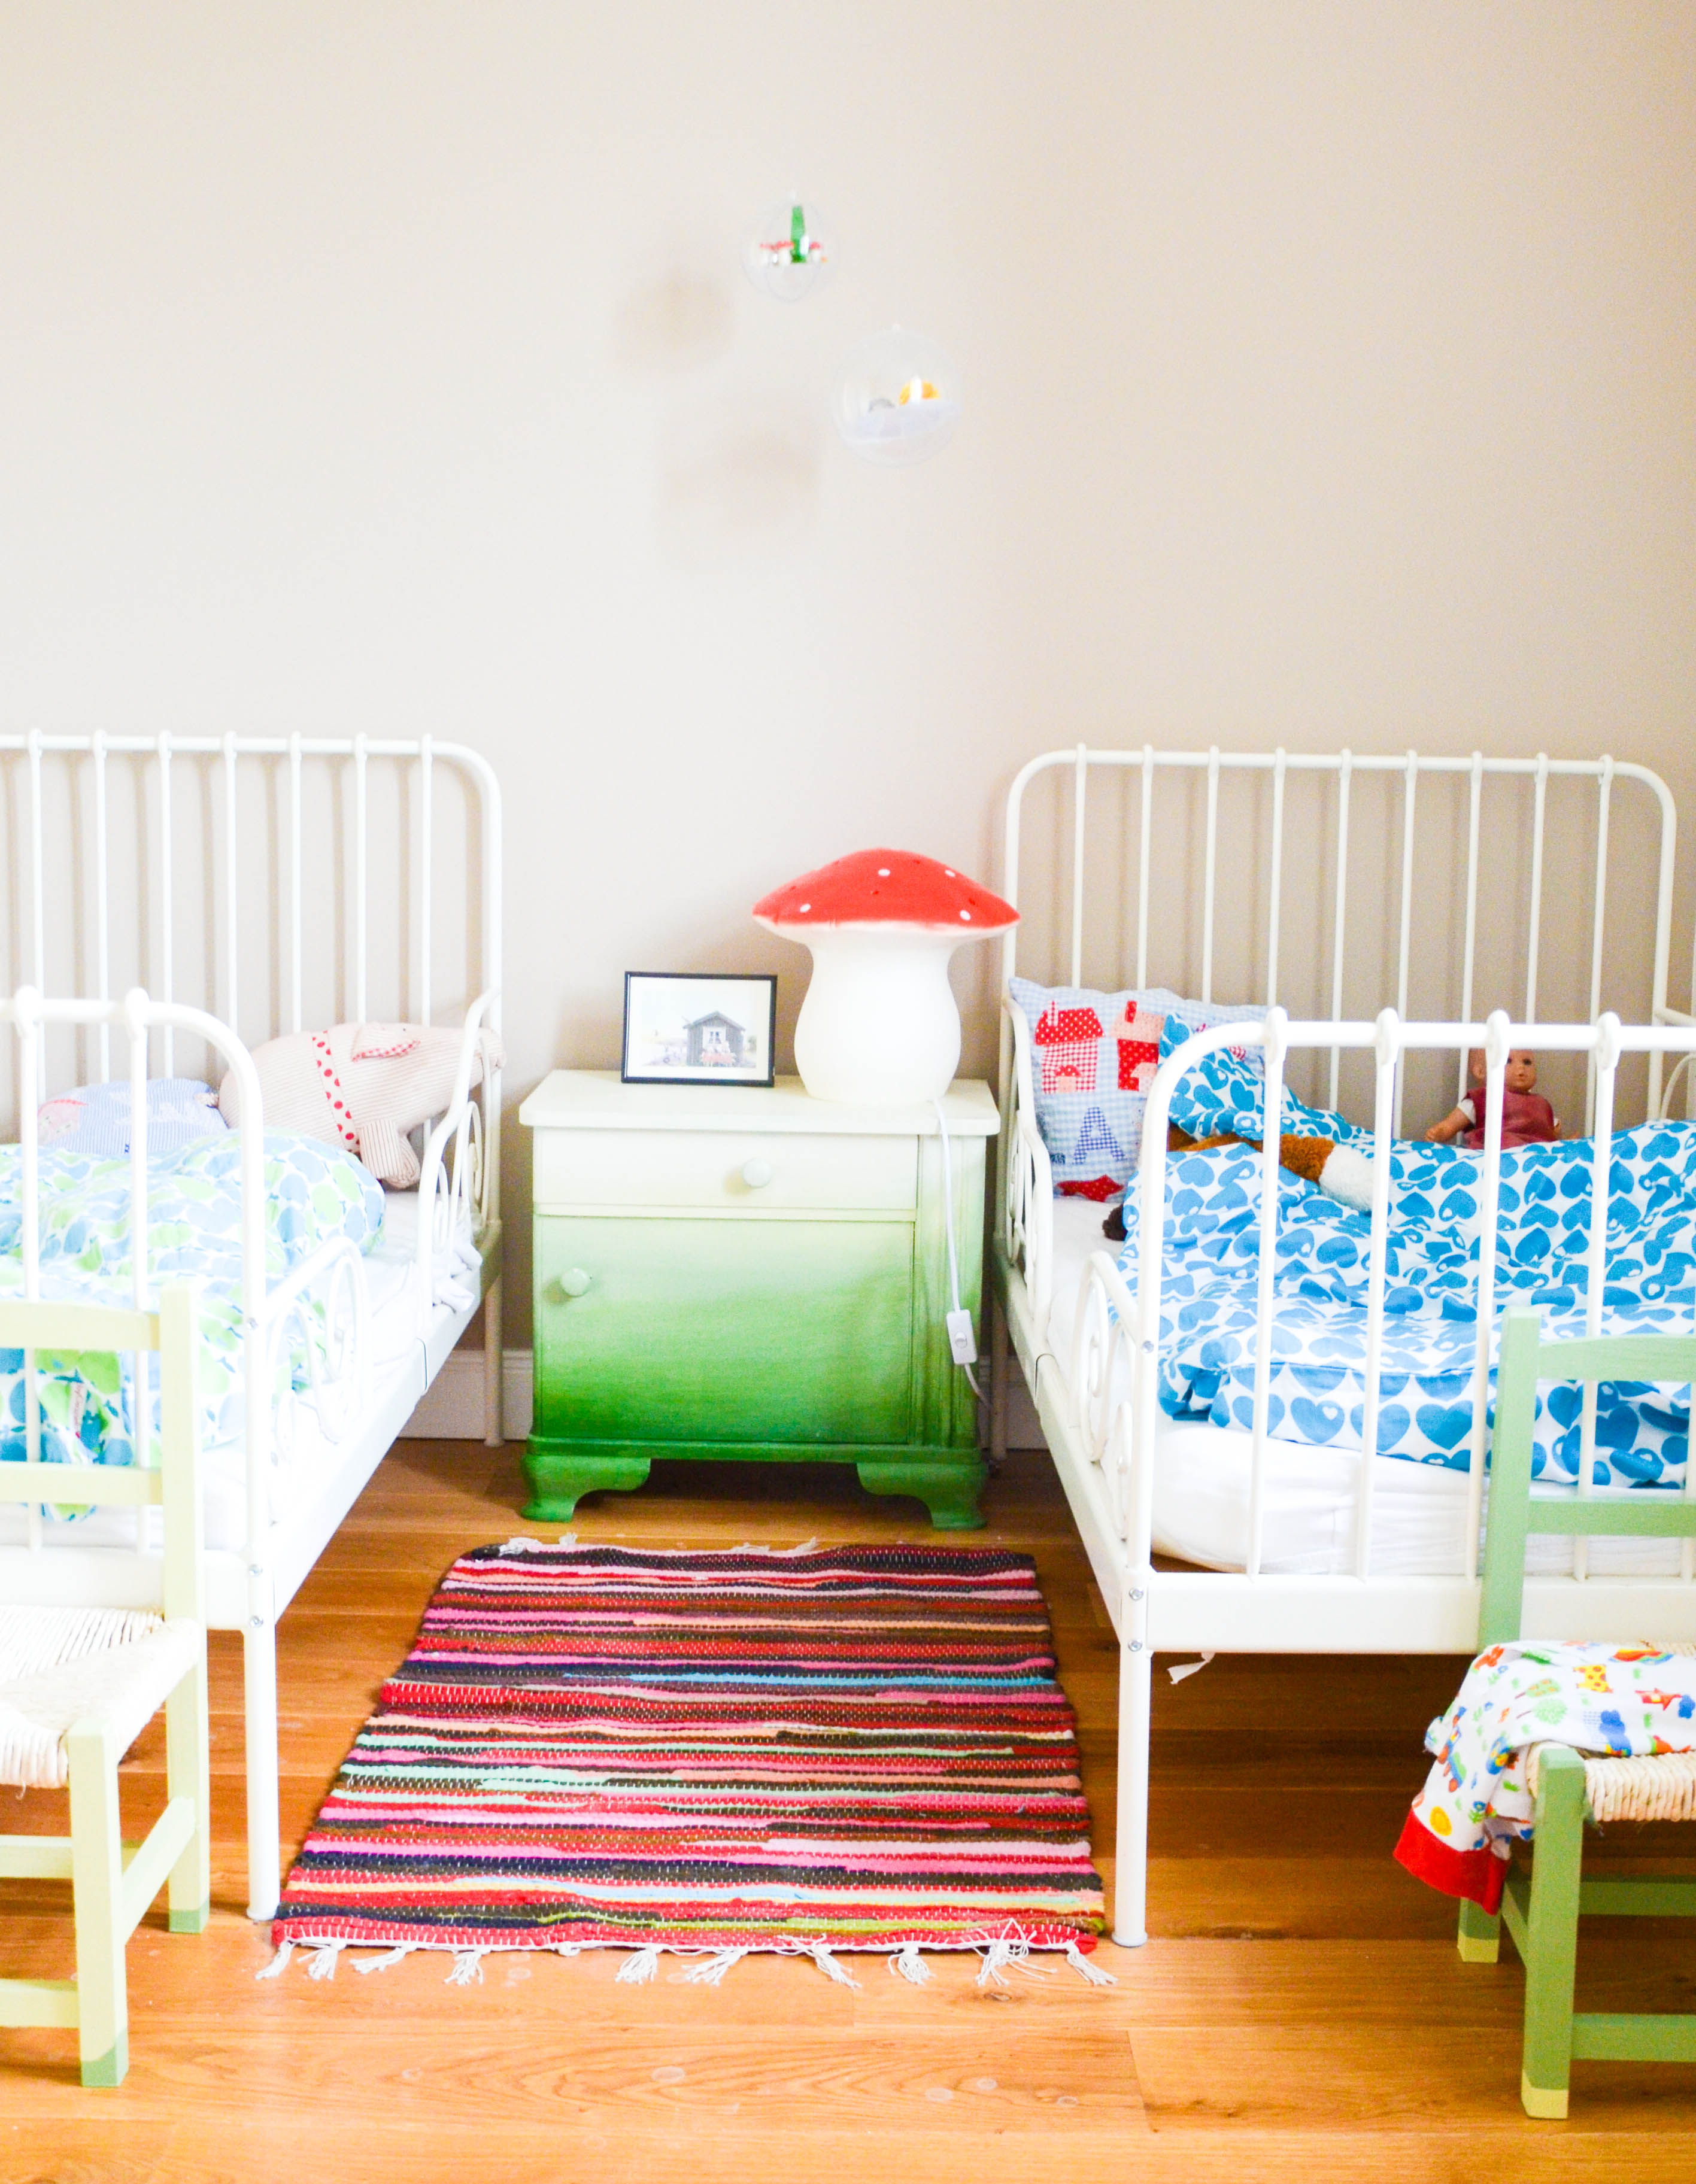 Kinderzimmer, Lieblingsbuch